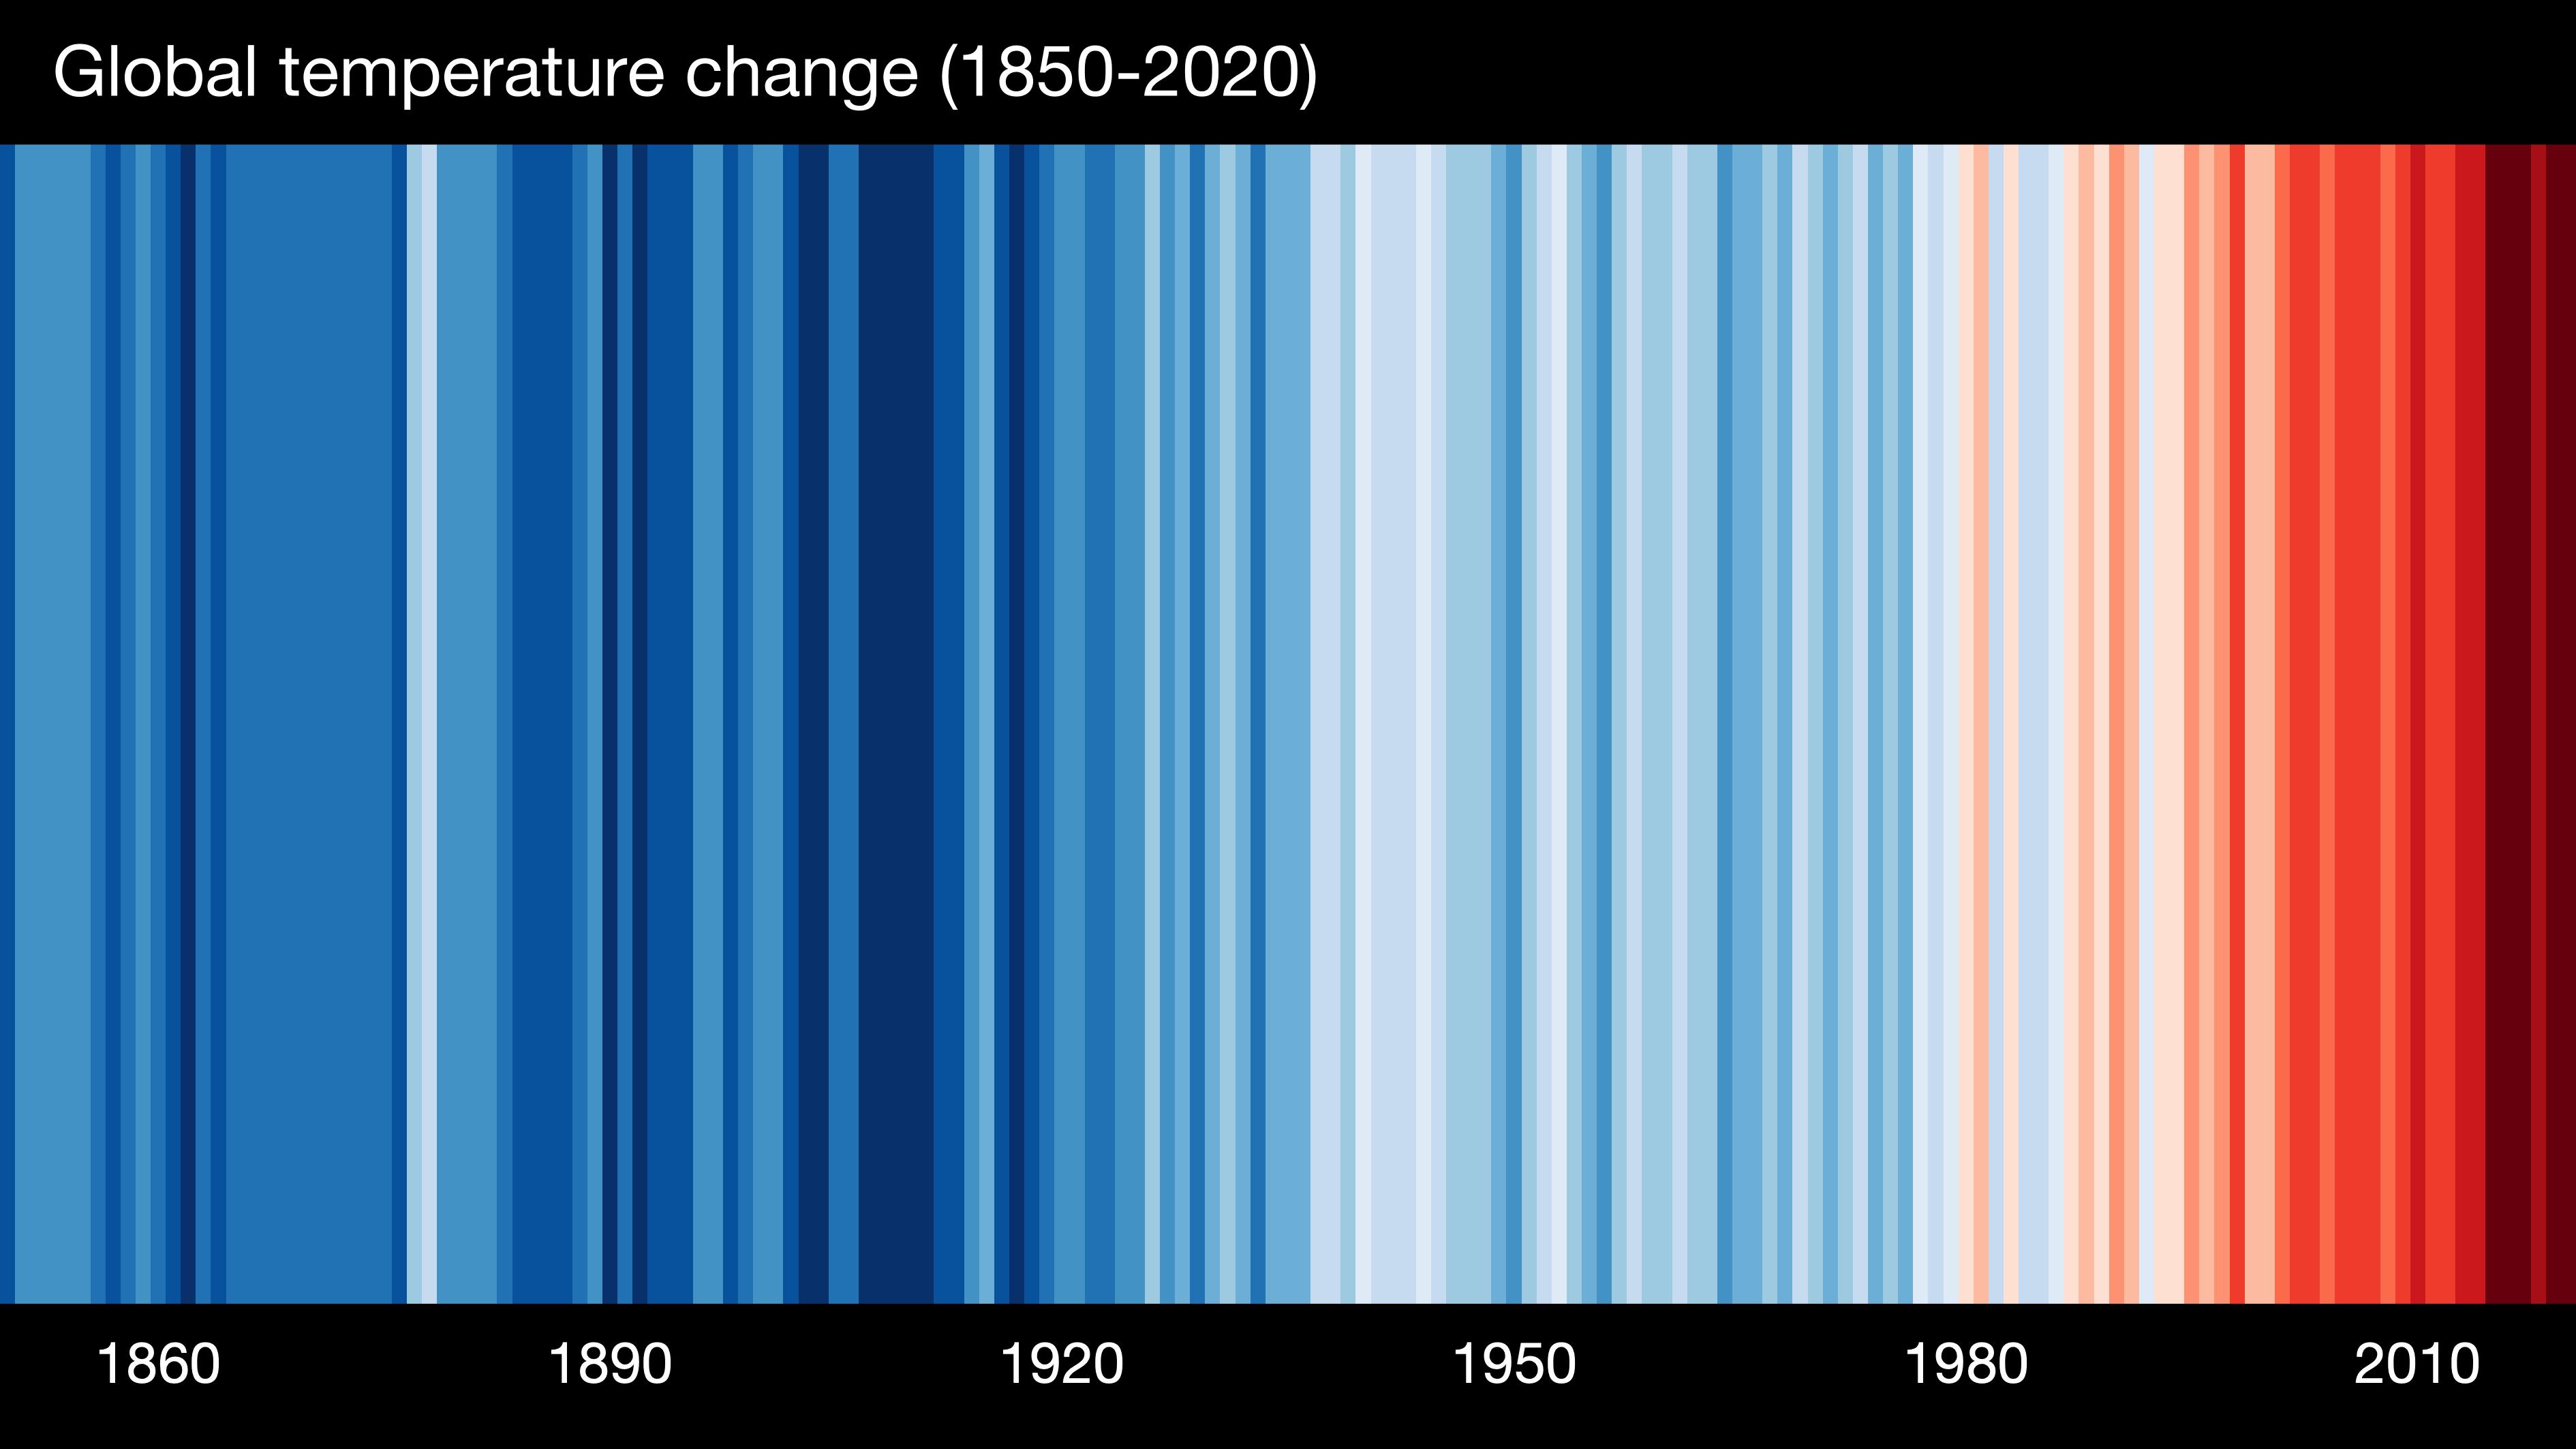 Globale Temperaturzunahme seit 1850. © Professor Ed Hawkins (University of Reading) · www.showyourstripes.info